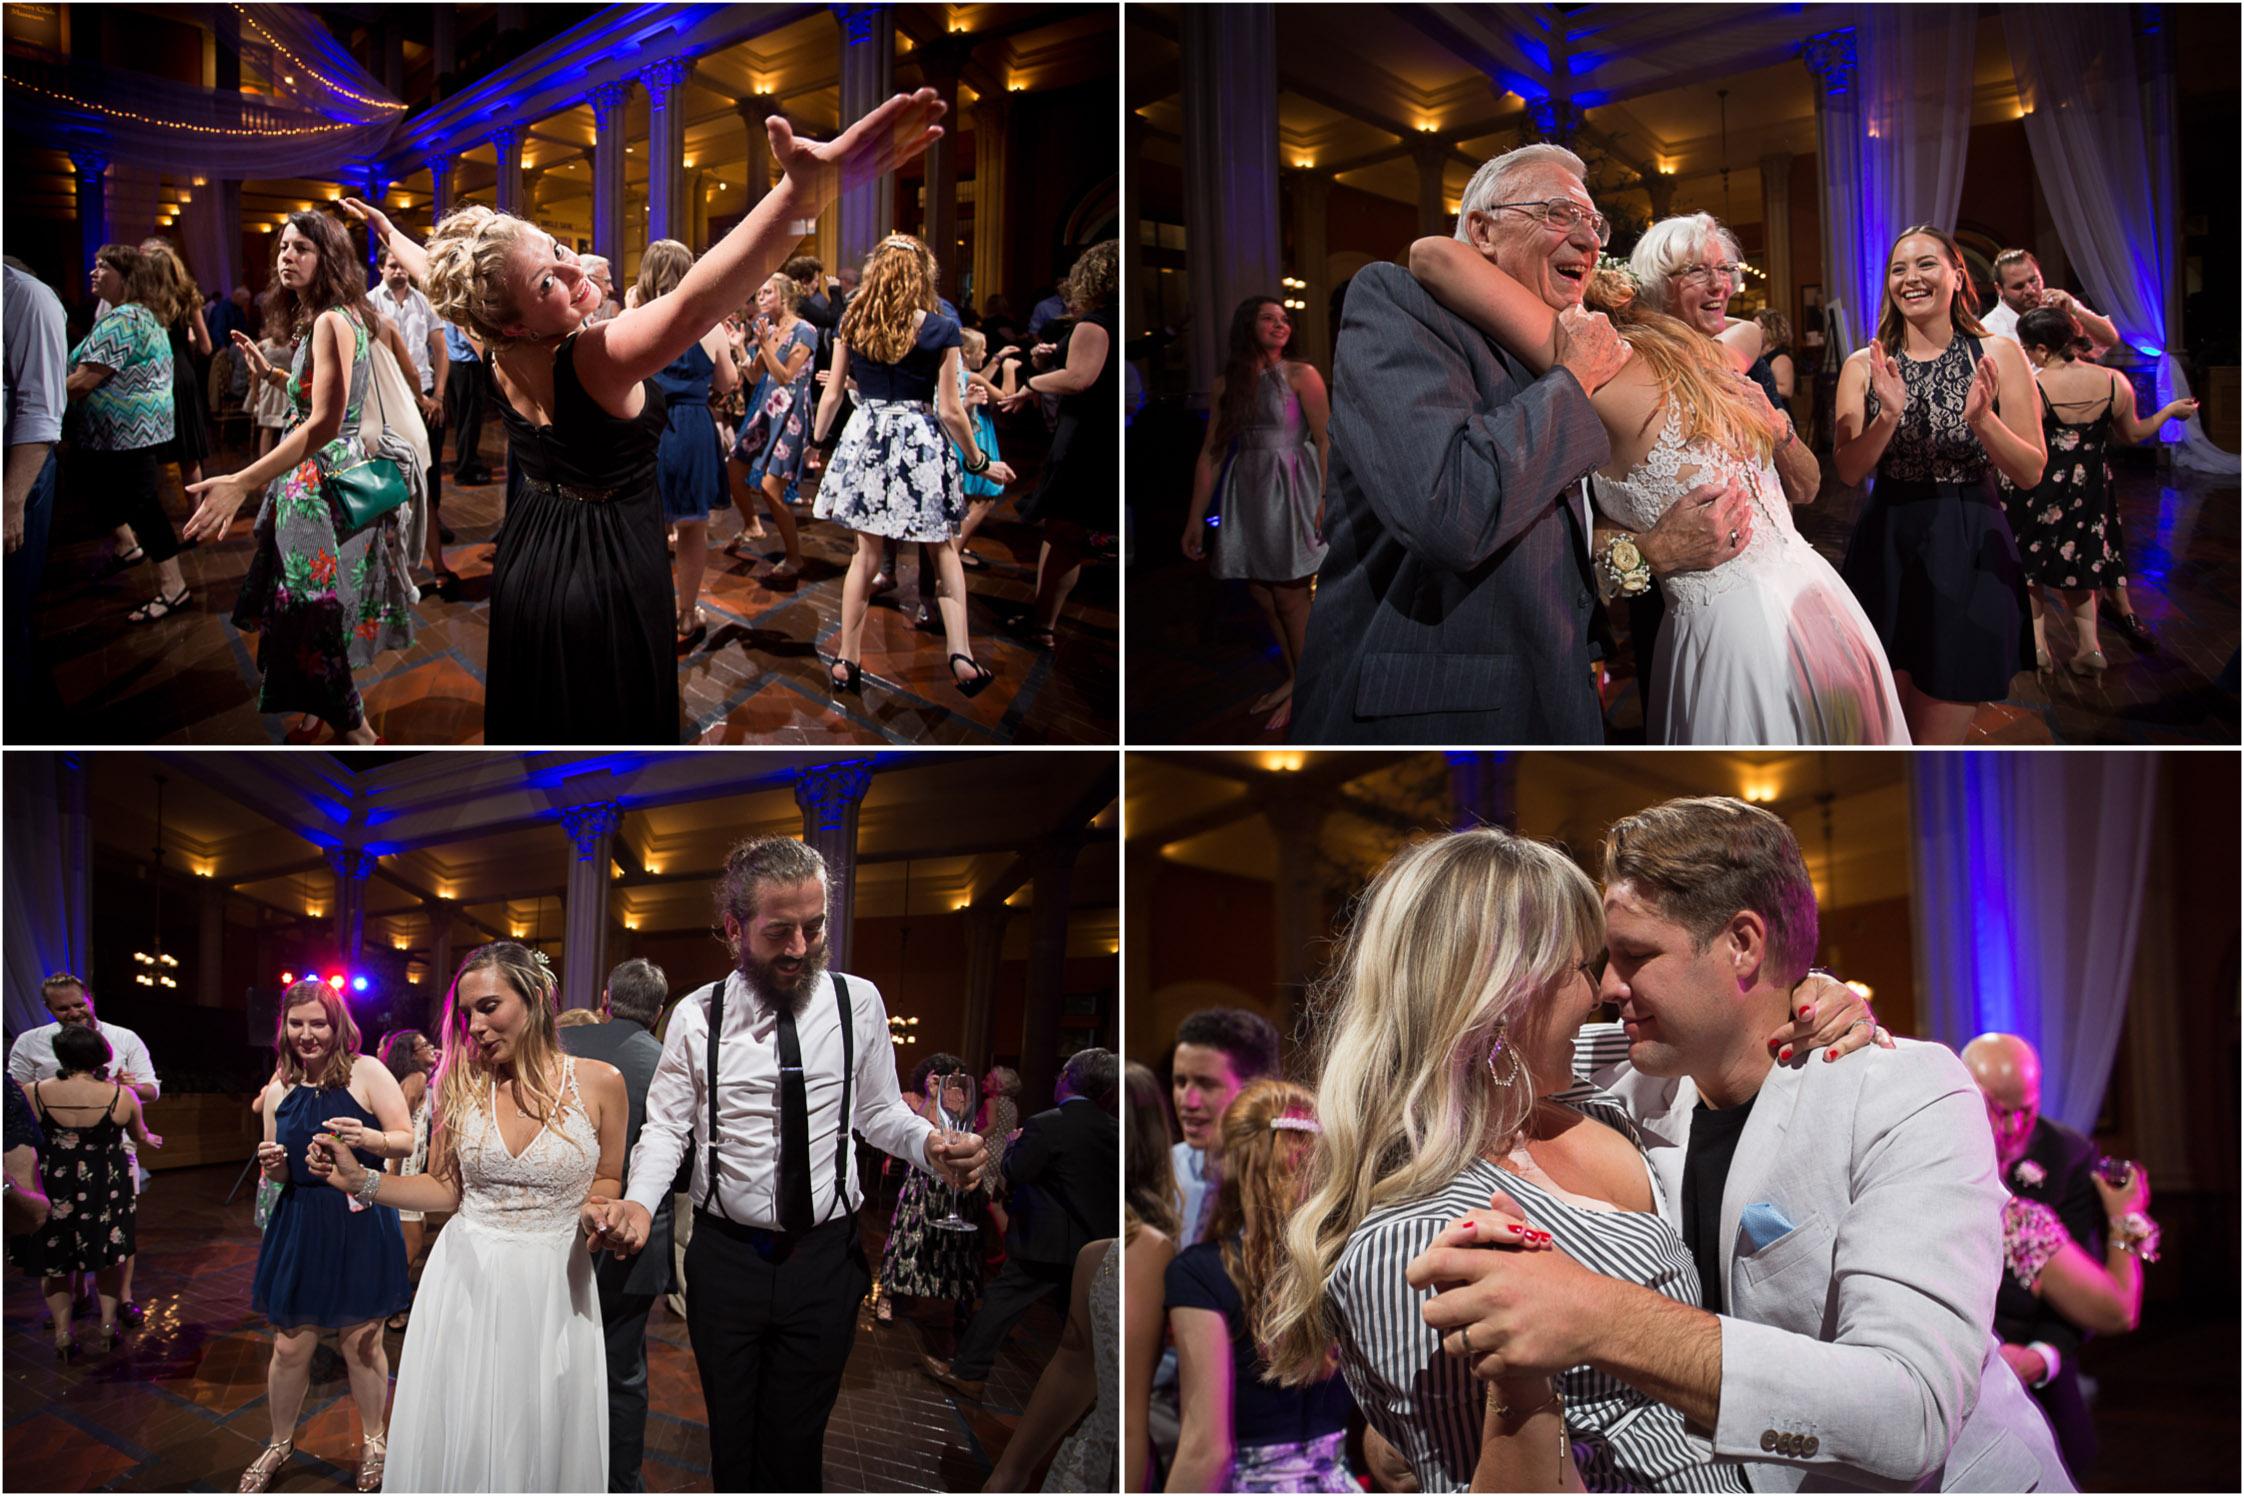 27-the-landmark-center-st-paul-mn-wedding-photographer-reception-fun-dance-dancing-mahonen-photography.jpg